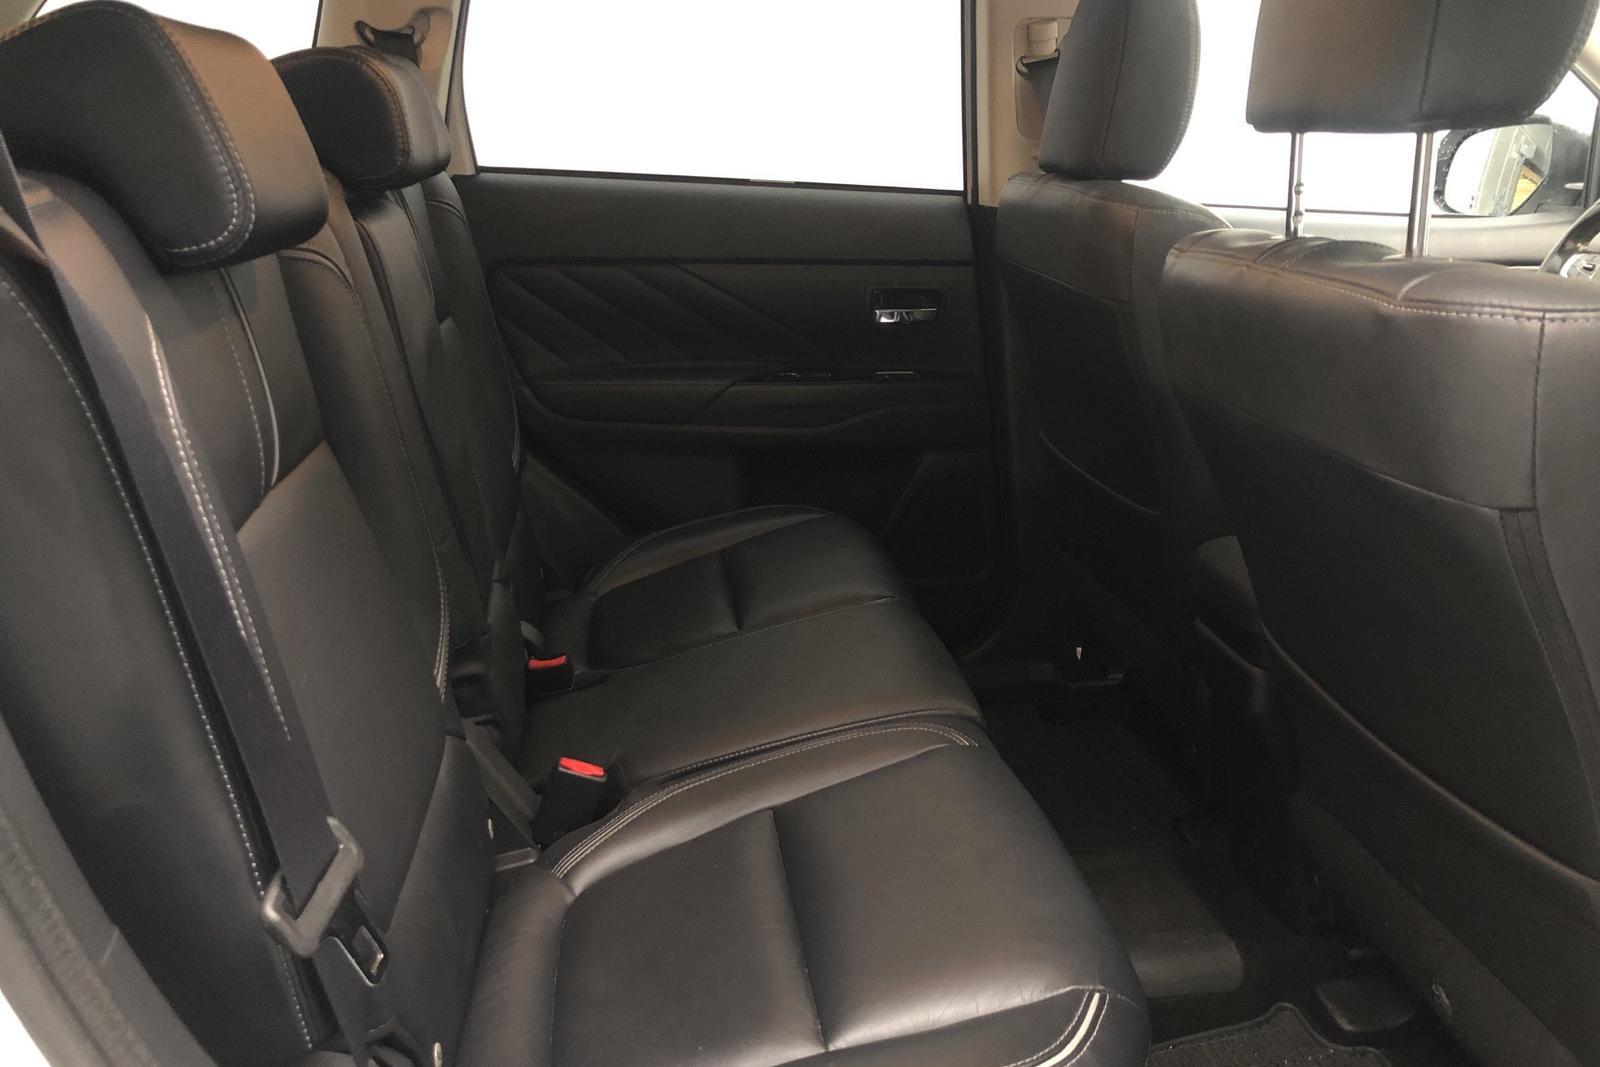 Mitsubishi Outlander 2.0 Plug-in Hybrid 4WD (121hk) - 9 646 mil - Automat - vit - 2017